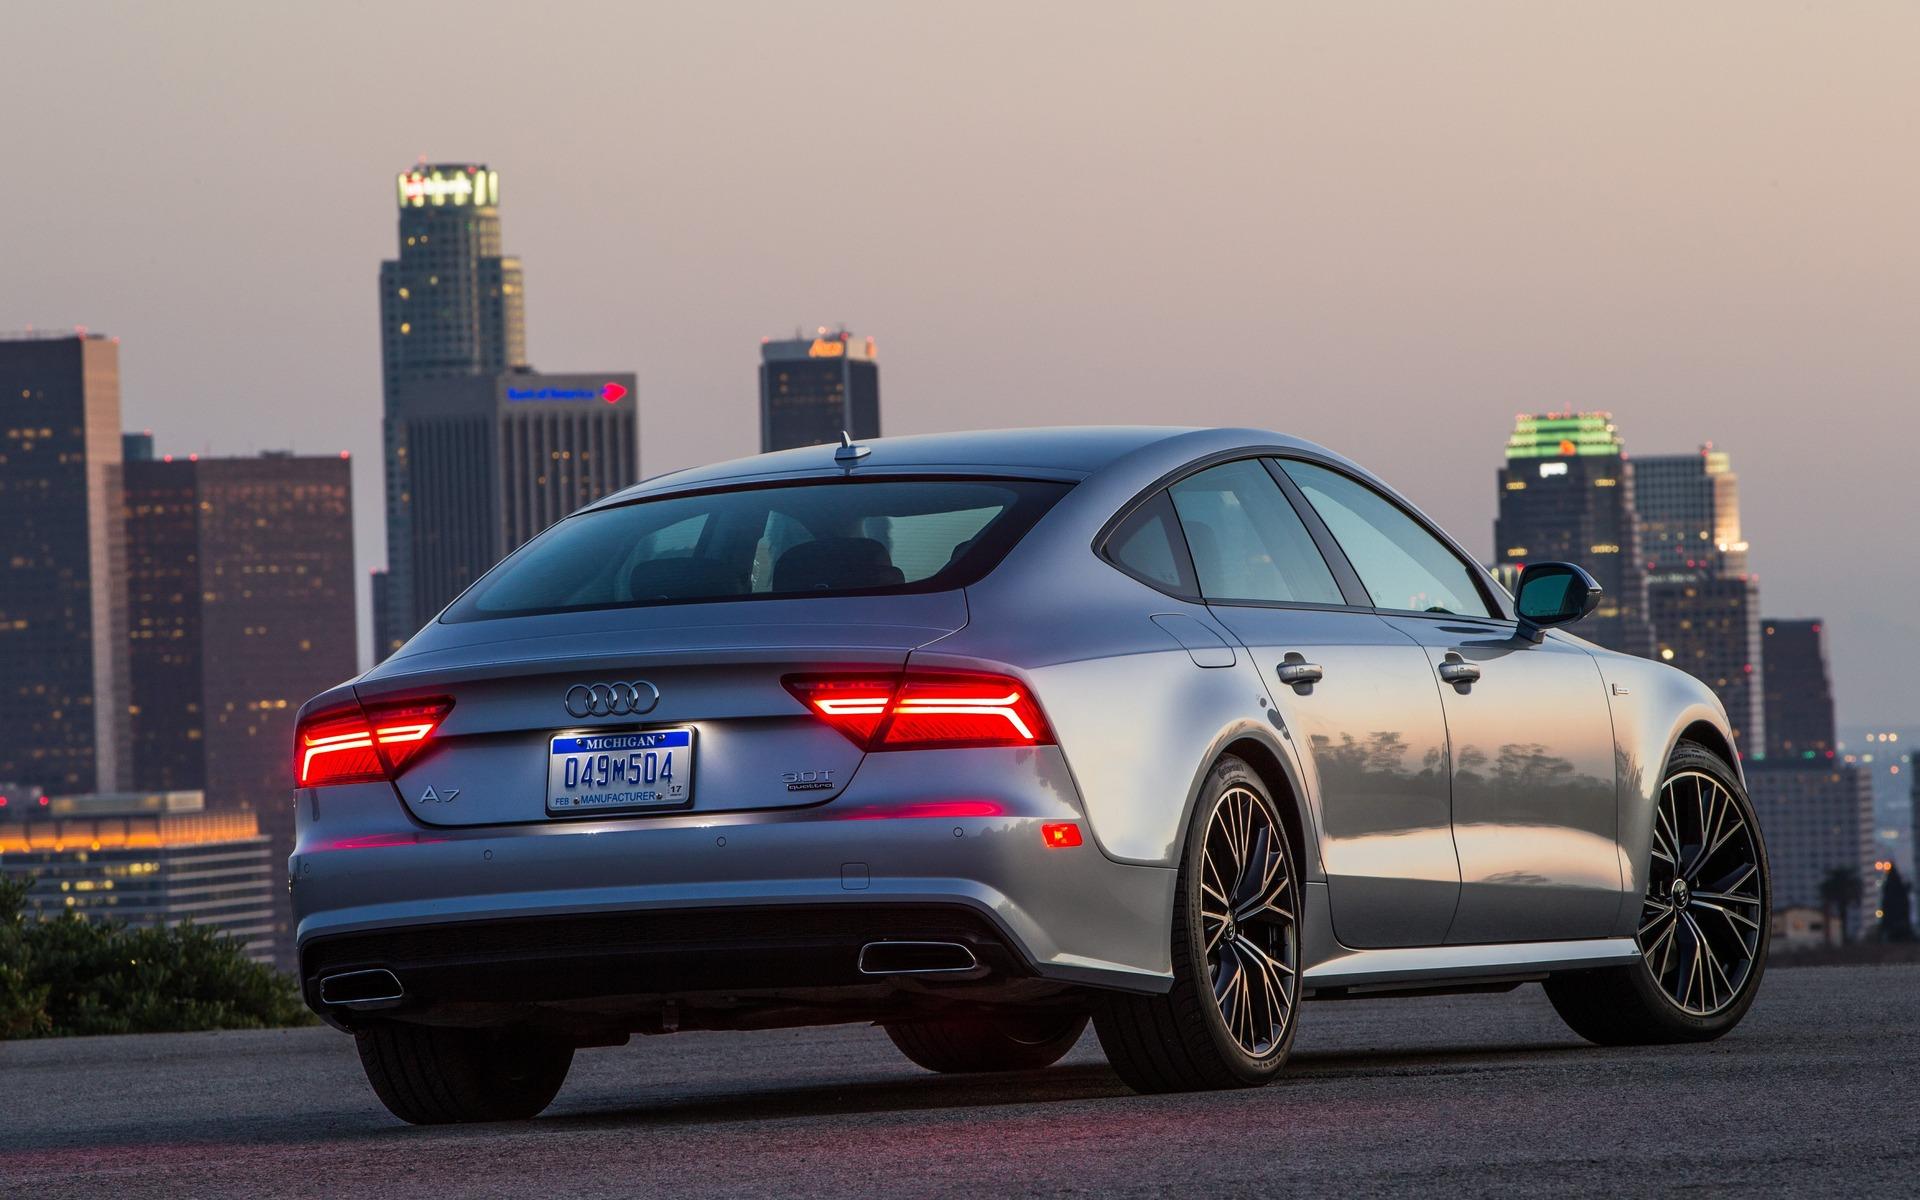 Kekurangan Audi 17 Tangguh